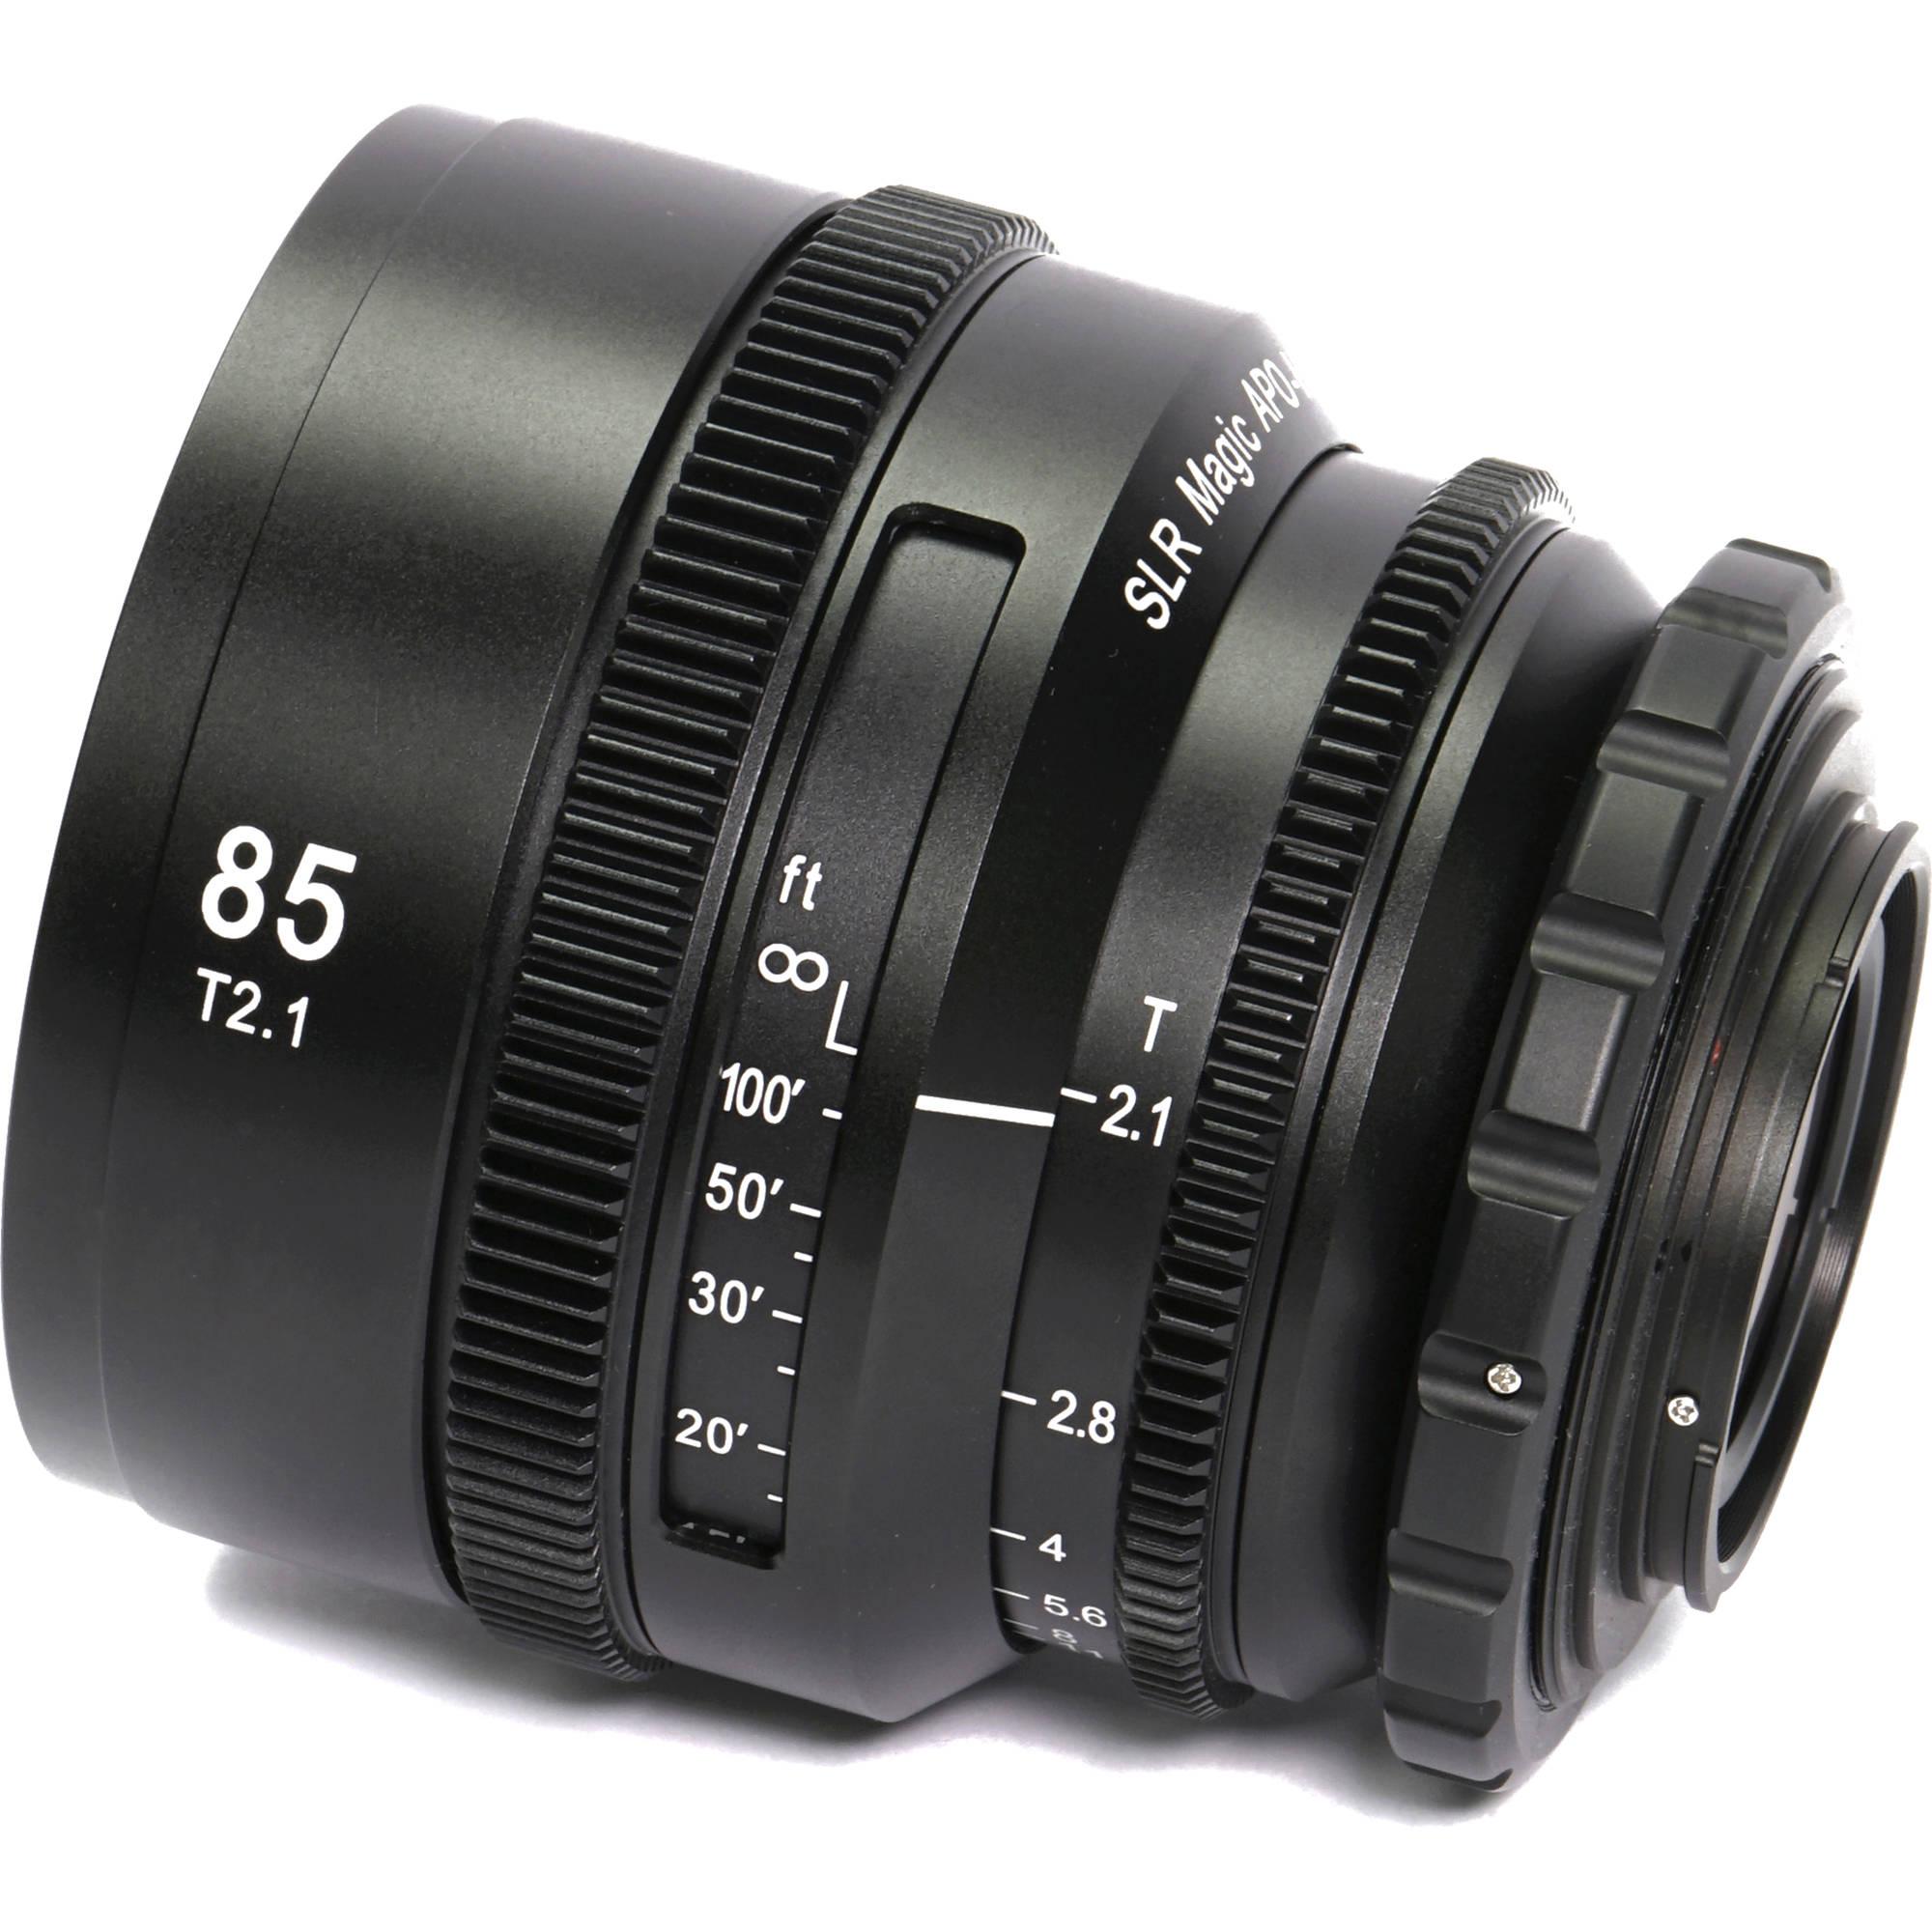 8041fe9f66 SLR Magic APO HyperPrime CINE 85mm T2.1 Lens (PL Mount with EF-Mount  Adapter)